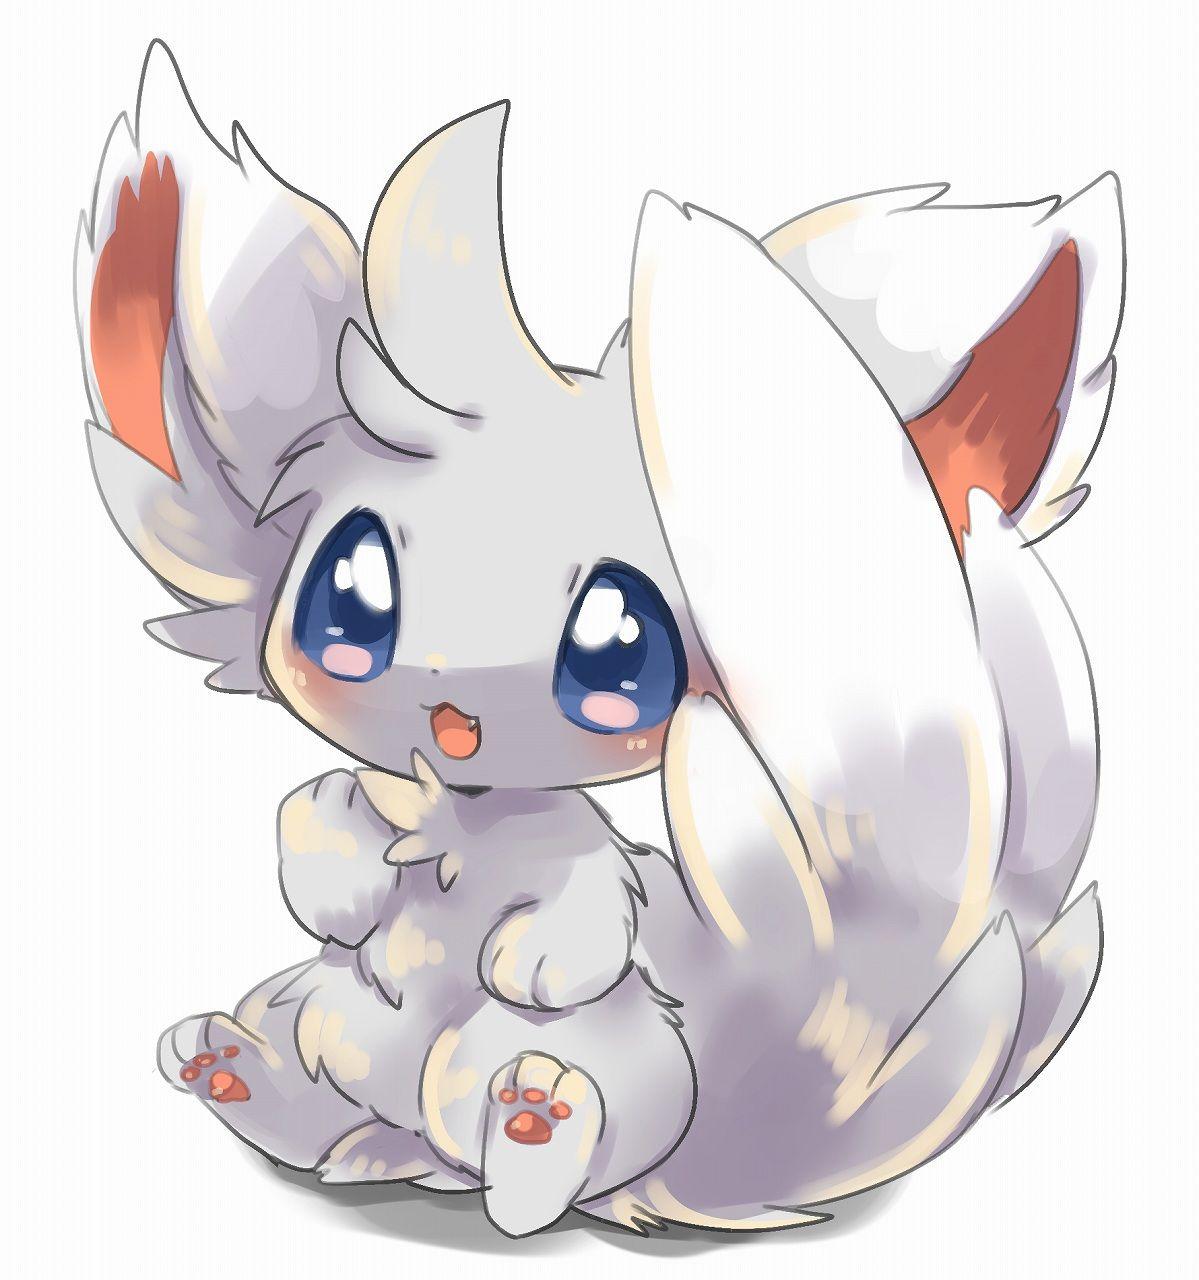 Pin by Eunice Lim Qian Ern on Pokemon | Pokemon, Baby